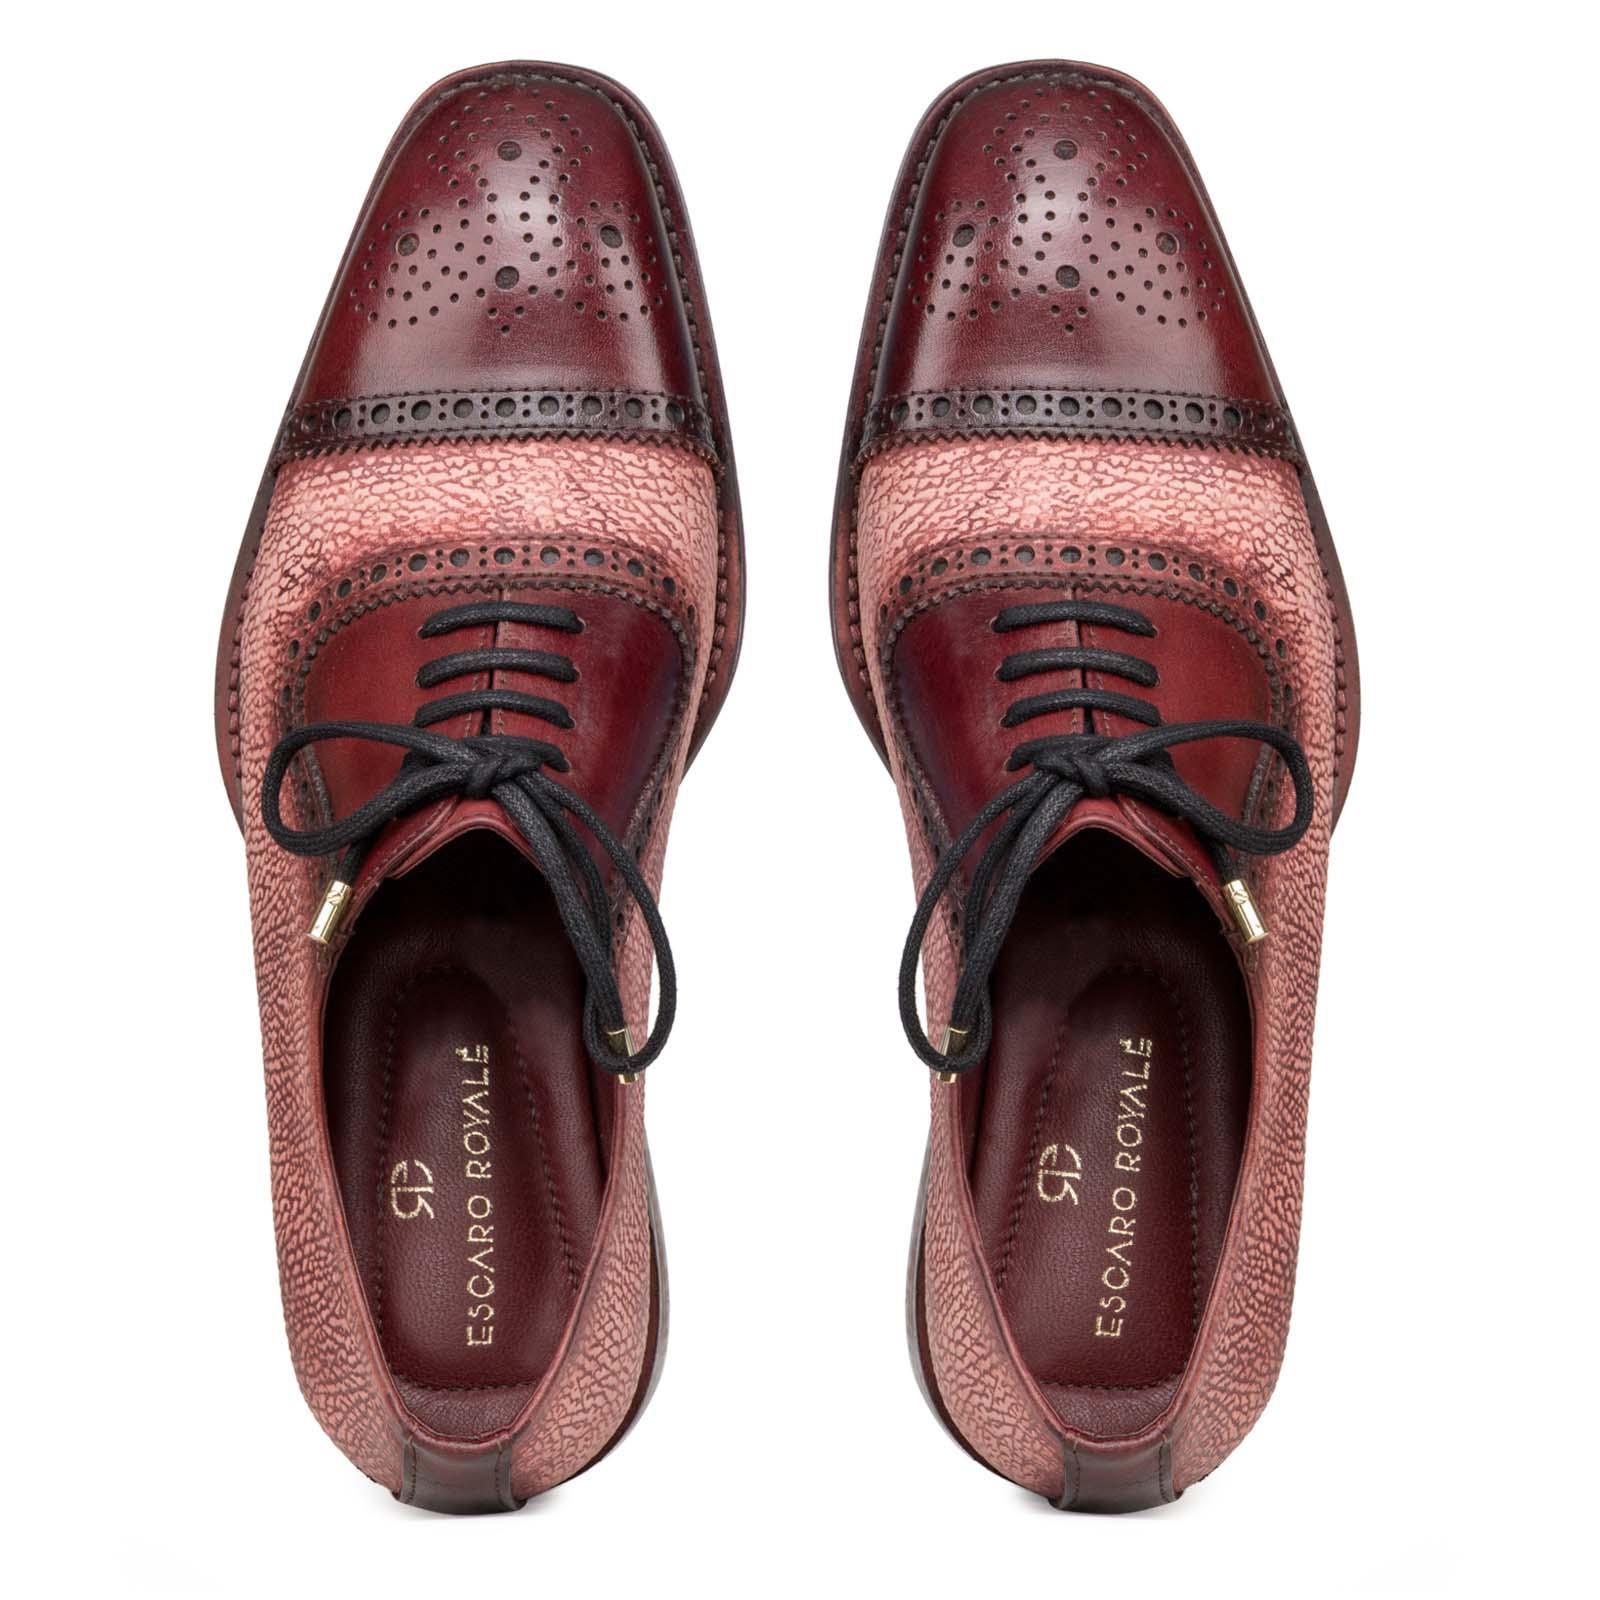 """Carlo"" Medallion Captoe Dual-Textured Cherry Oxfords"